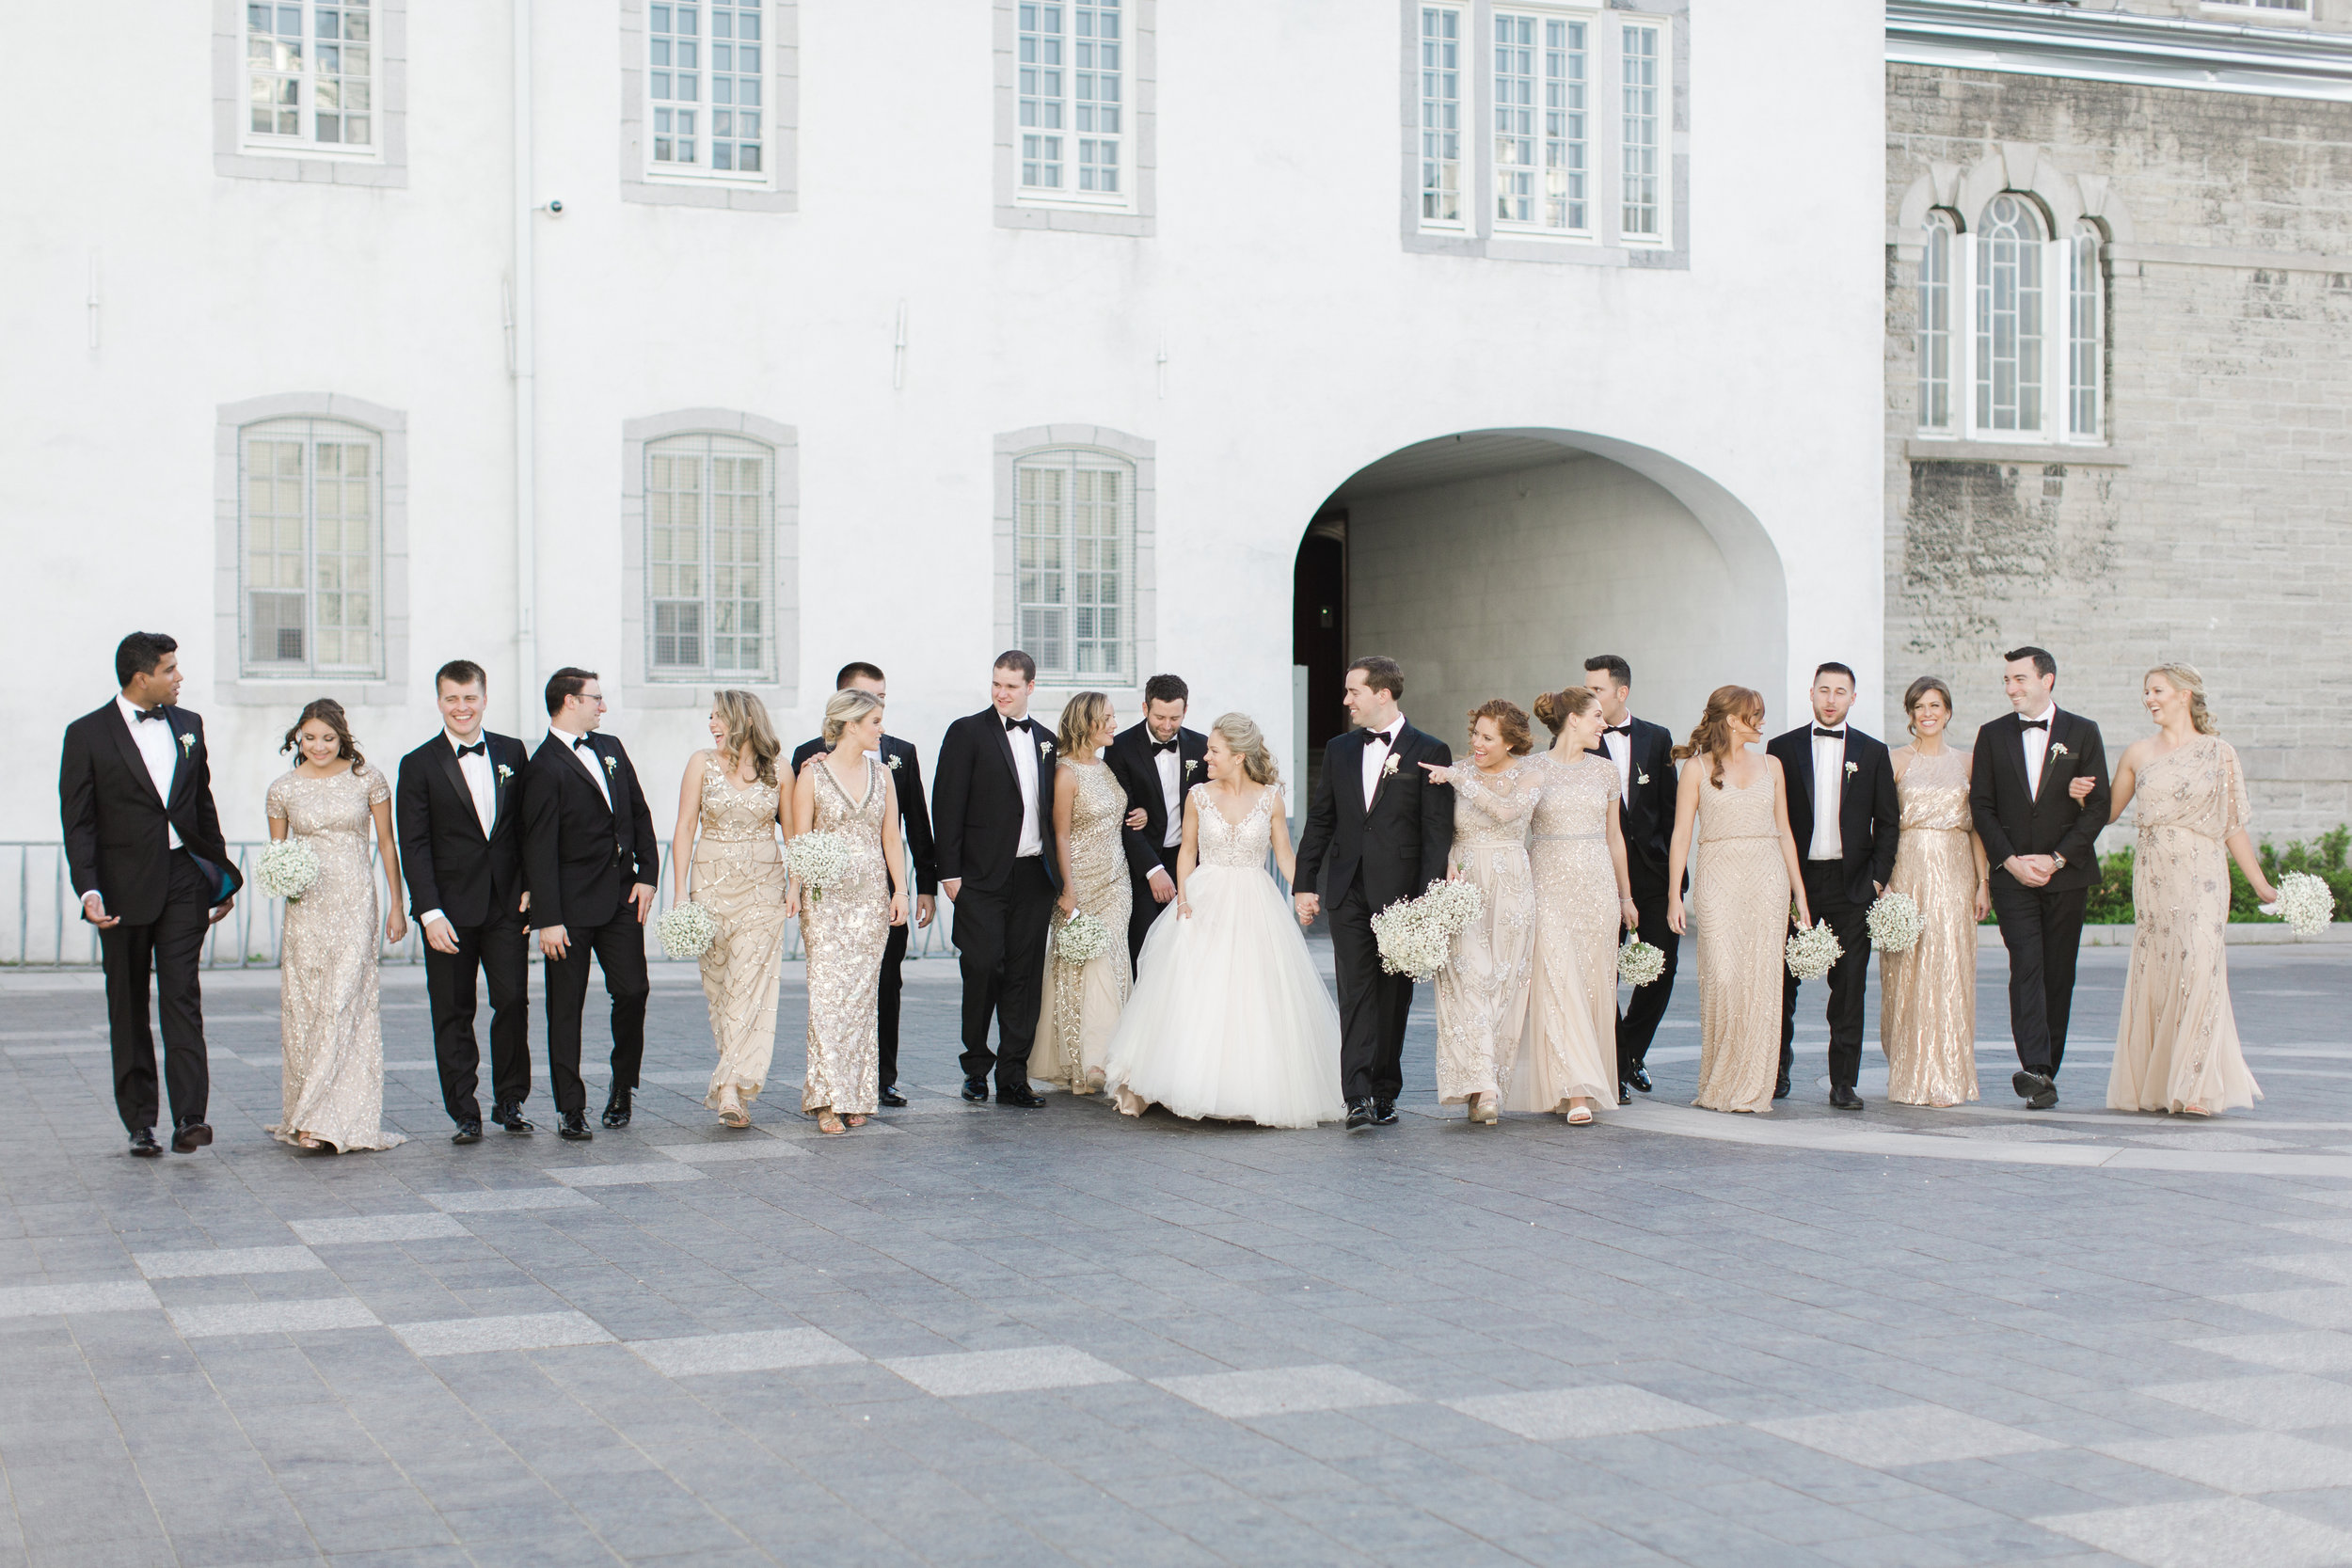 chateau-frontenac-quebec-city-best-toronto-wedding-photographer-soft-bright-pastel-richelle-hunter-elliott-heidi-616.jpg